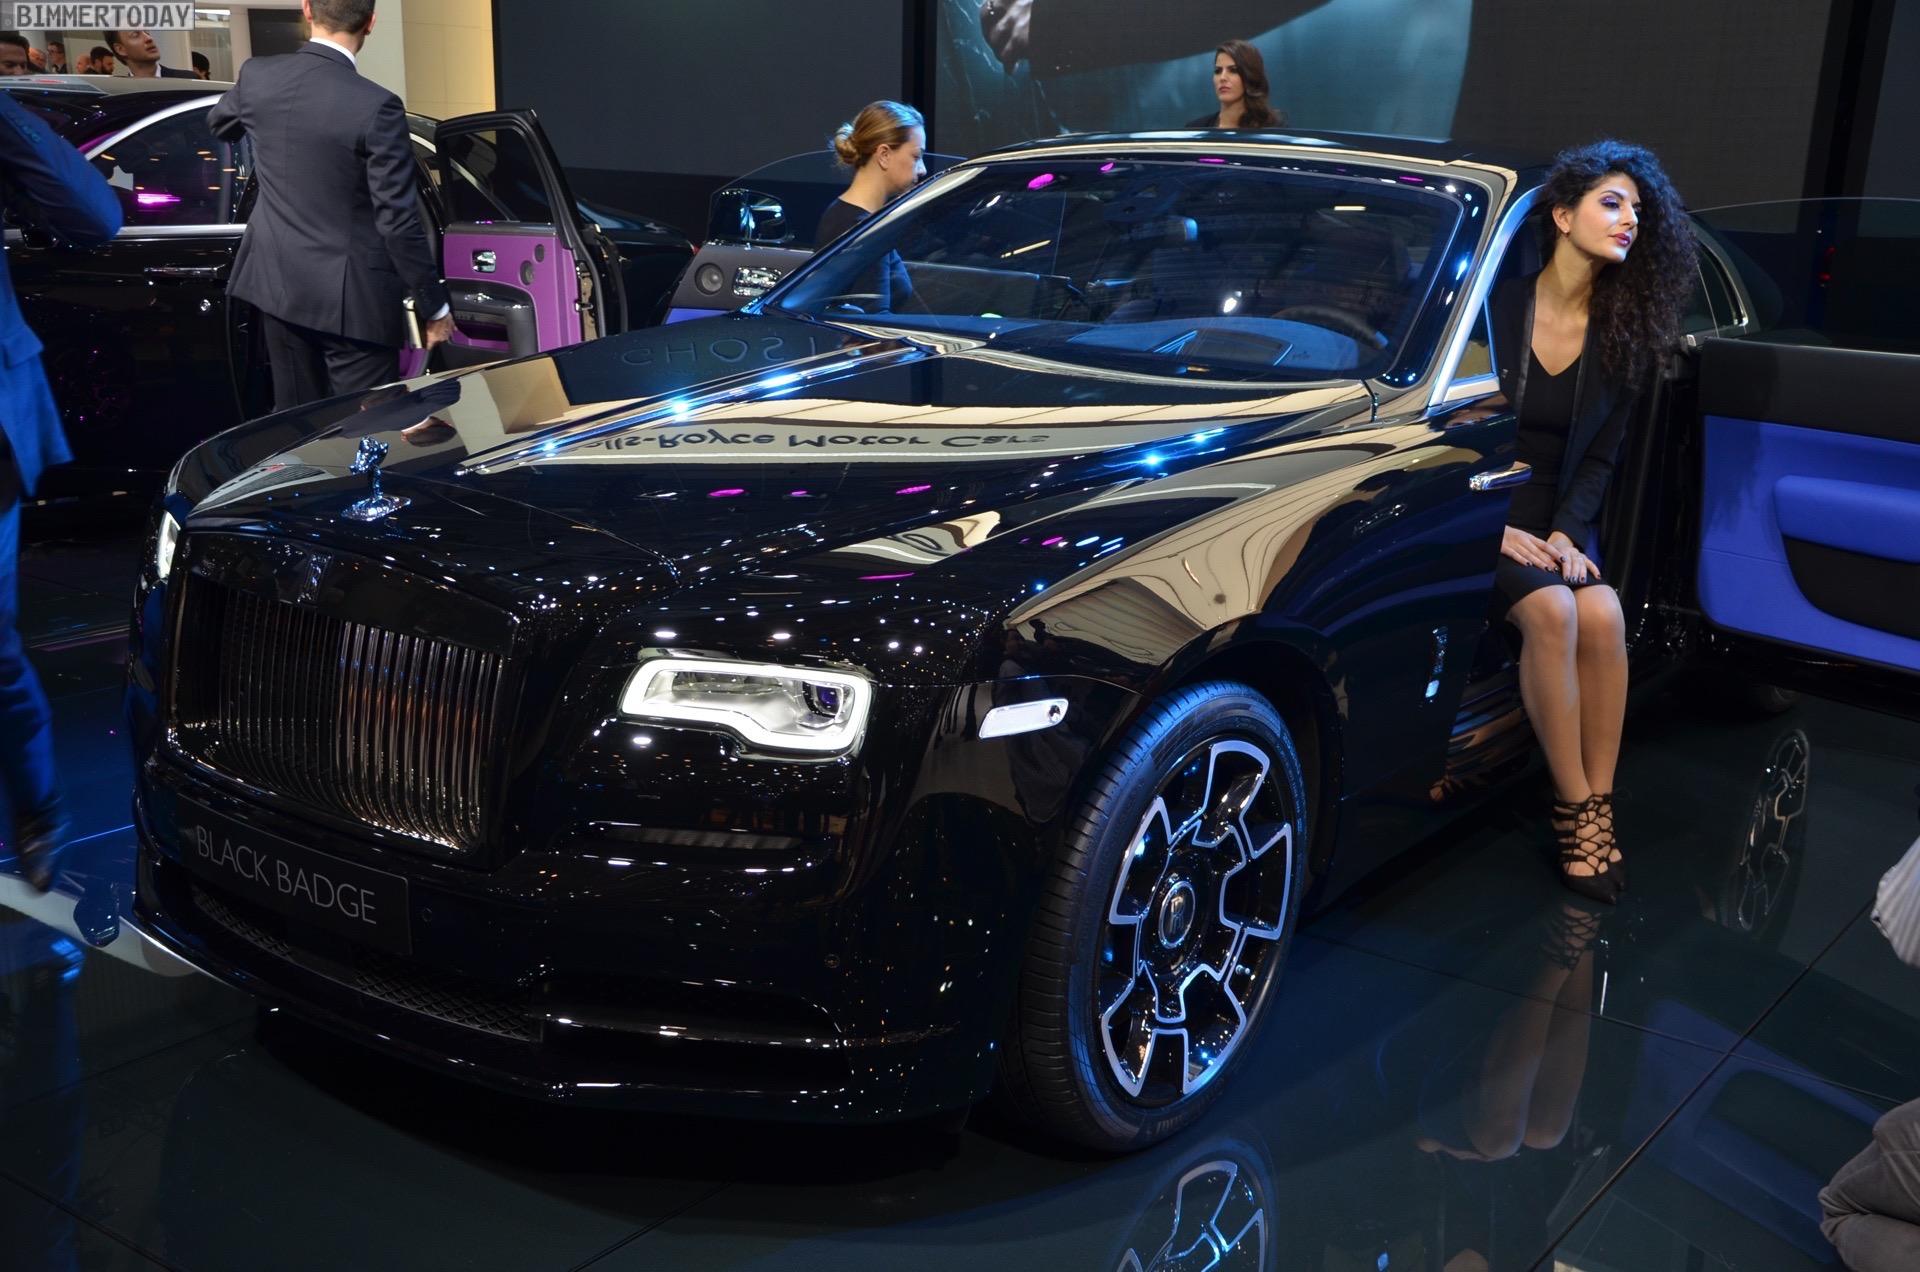 Rolls Royce Wraith Black Badge 2016 Genf Autosalon Live 12